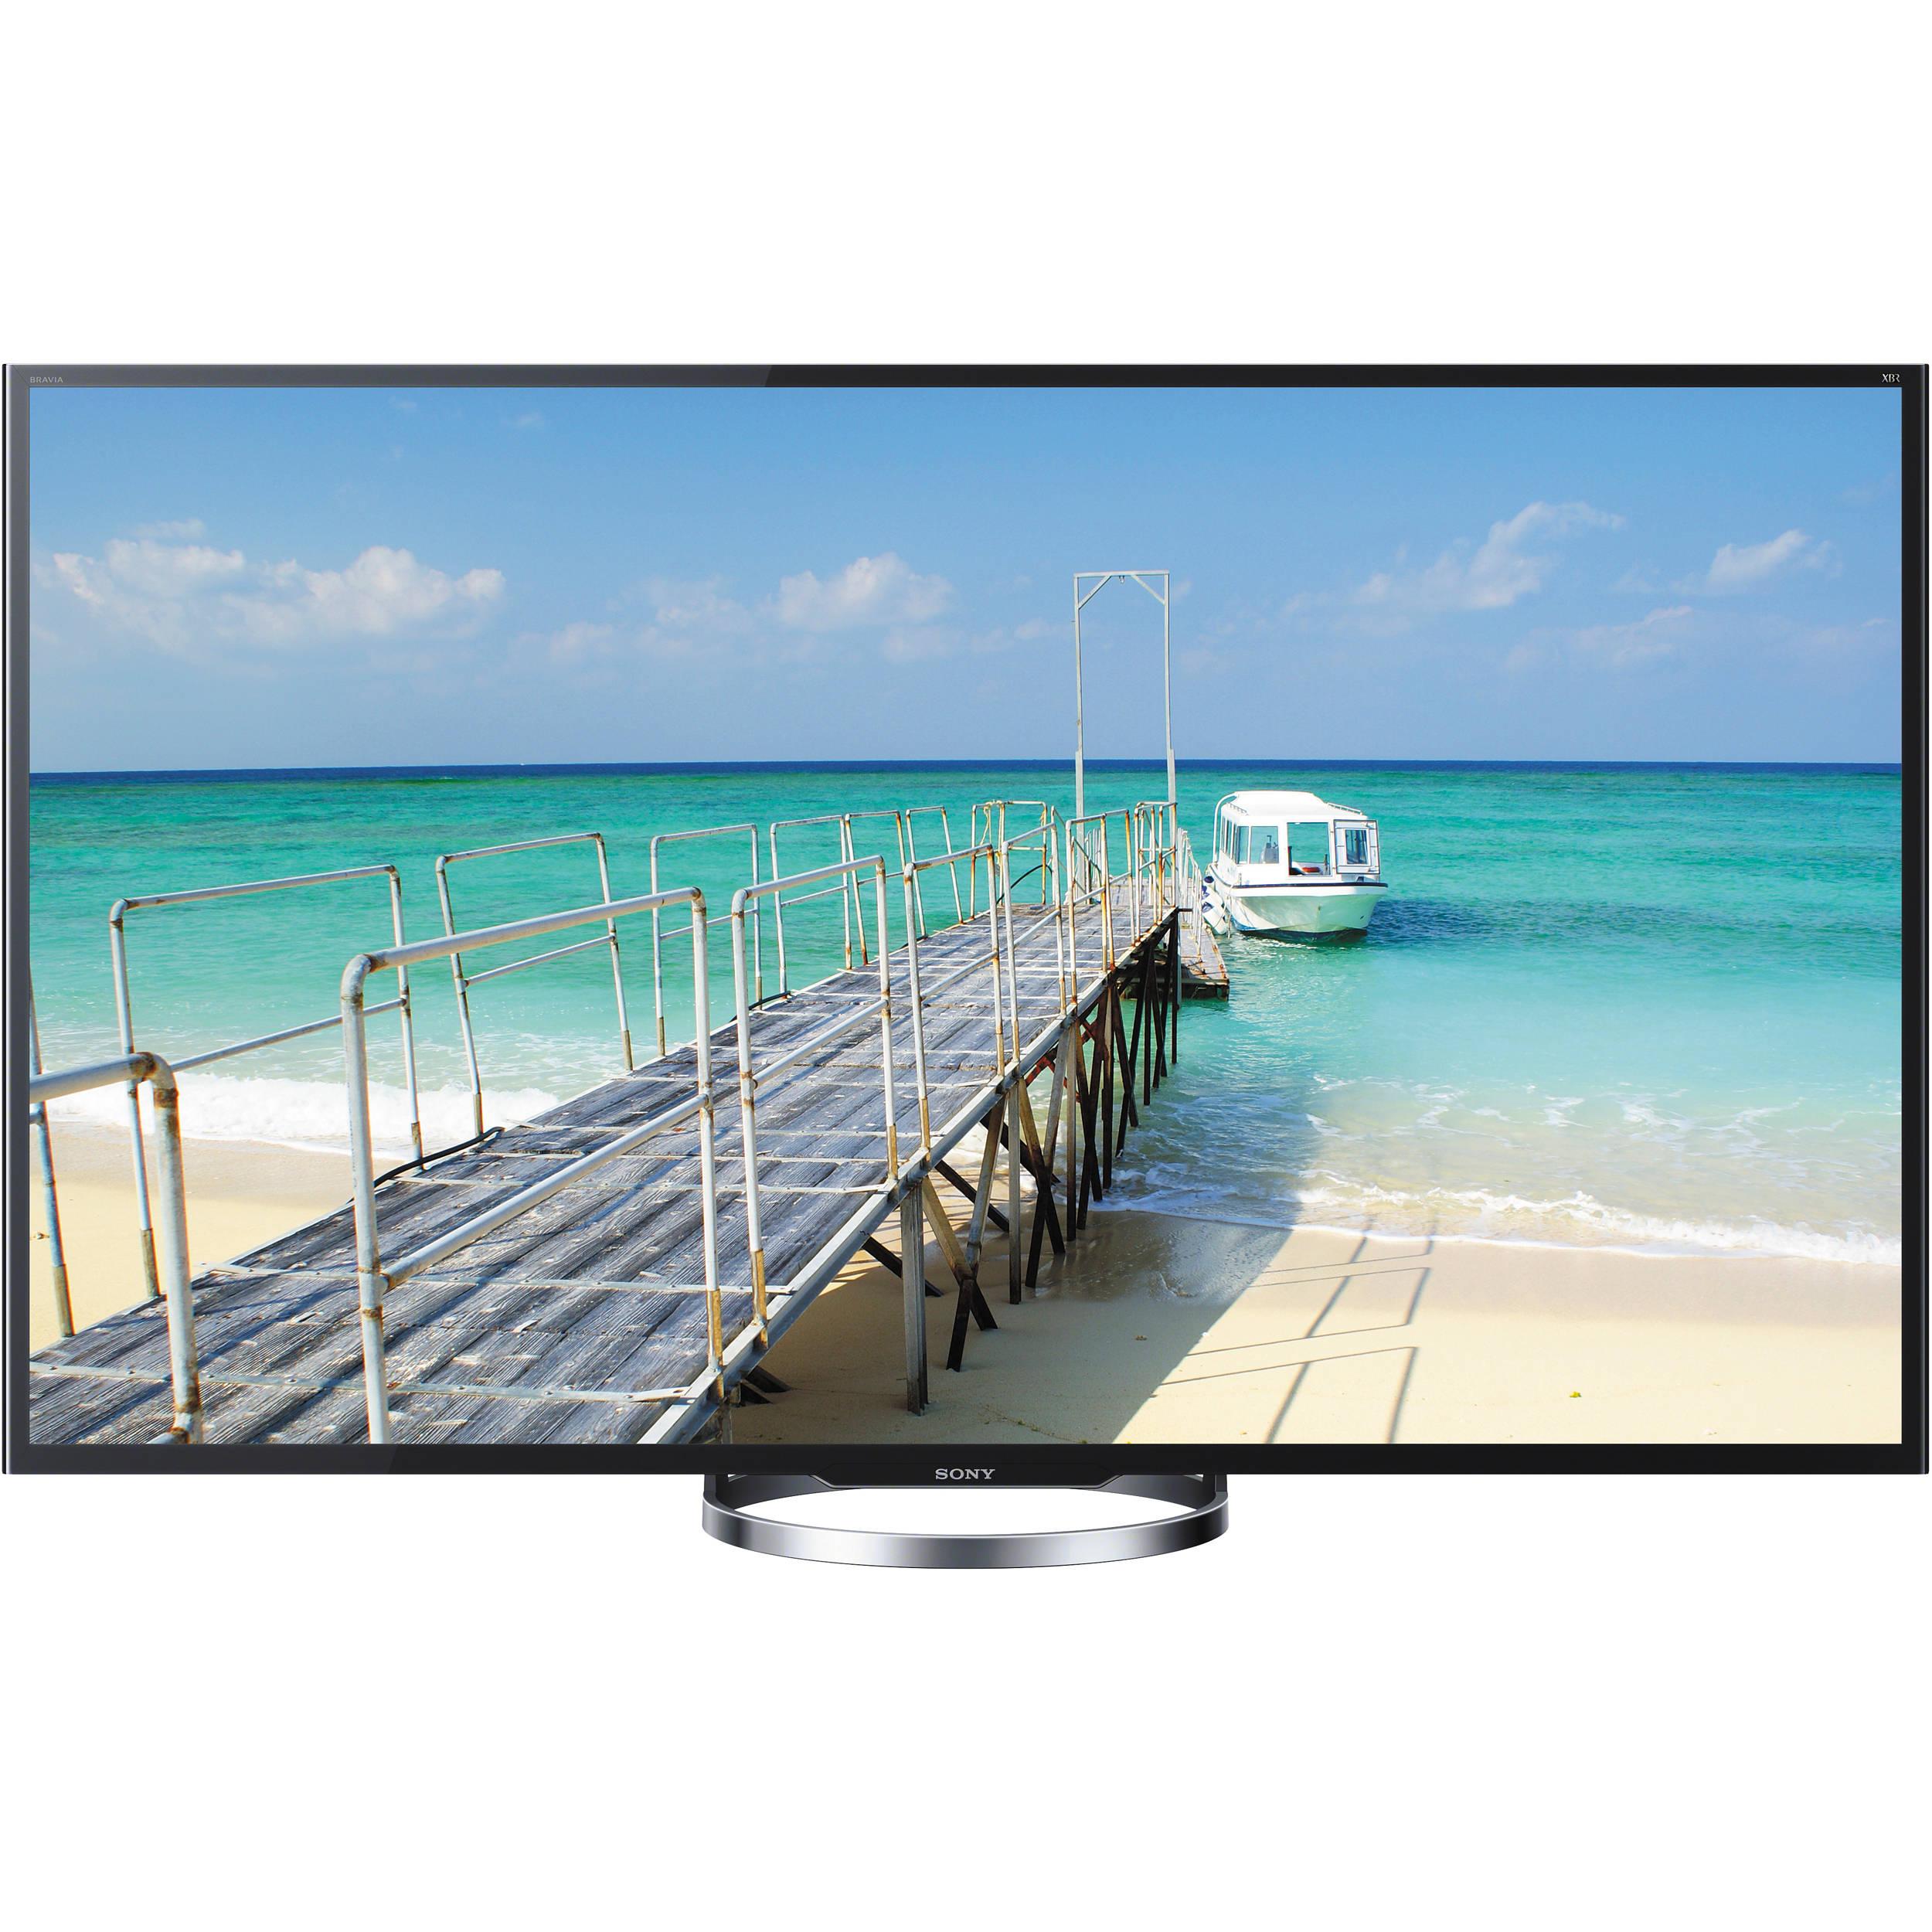 Sony XBR55X850B 55-Inch 4K Ultra HD 120Hz 3D Smart LED TV | 4K ...